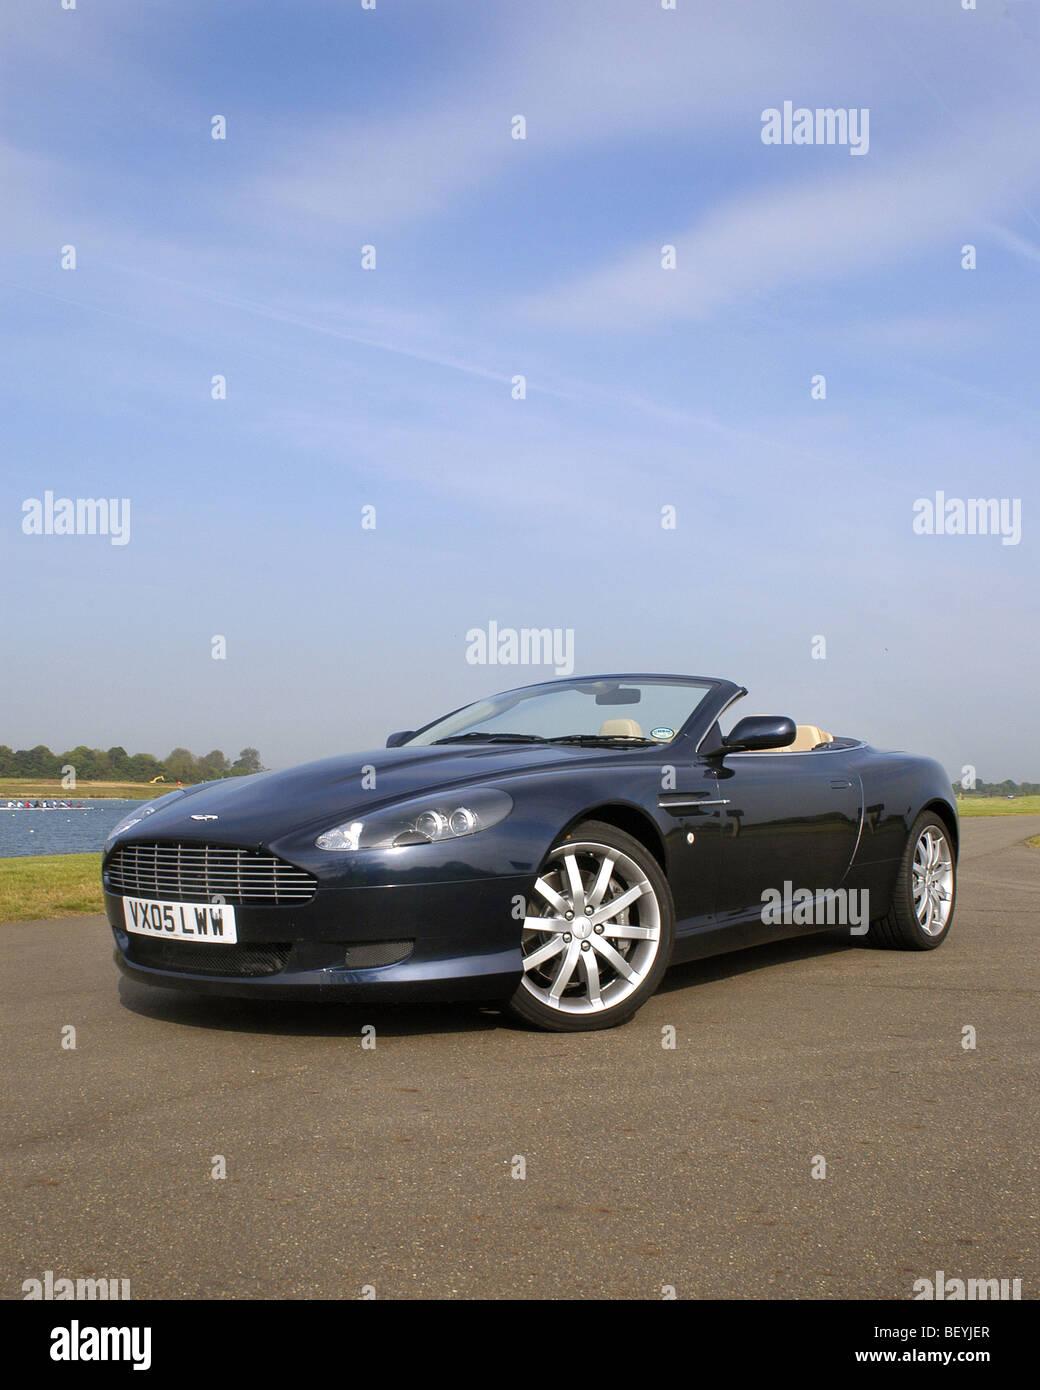 Aston Martin DB9 Volante Stockbild